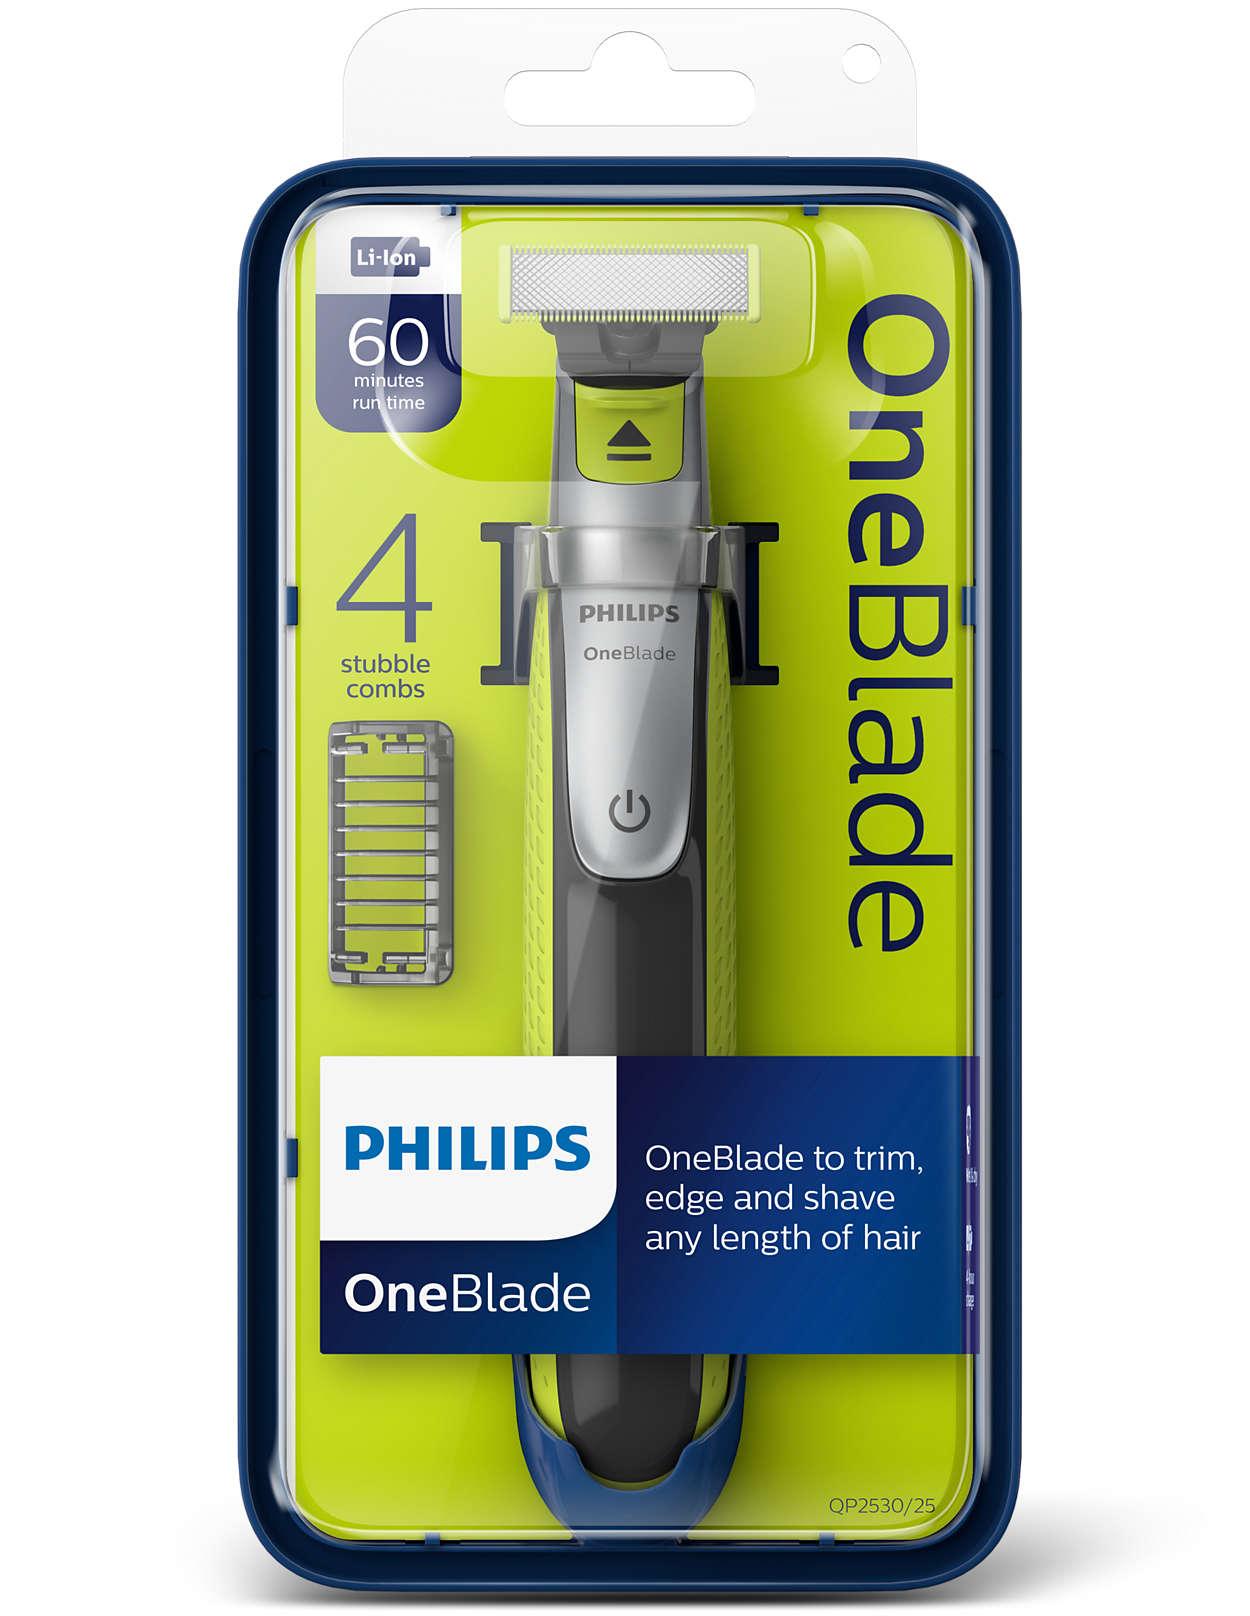 philips oneblade electric trimmer styler shaver 4x combs. Black Bedroom Furniture Sets. Home Design Ideas